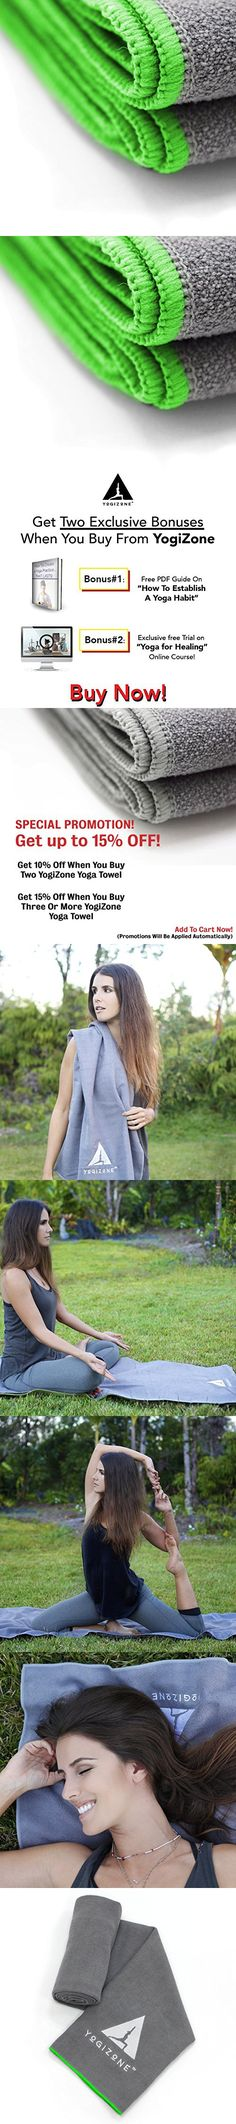 "Super-Absorbent Non-Skid Microfiber Yoga Towel / Mat Cover for Hot Yoga, Bikram Yoga & Pilates | Bonus eBook & Course Free Trial | 24"" x 72"" by YogiZone"